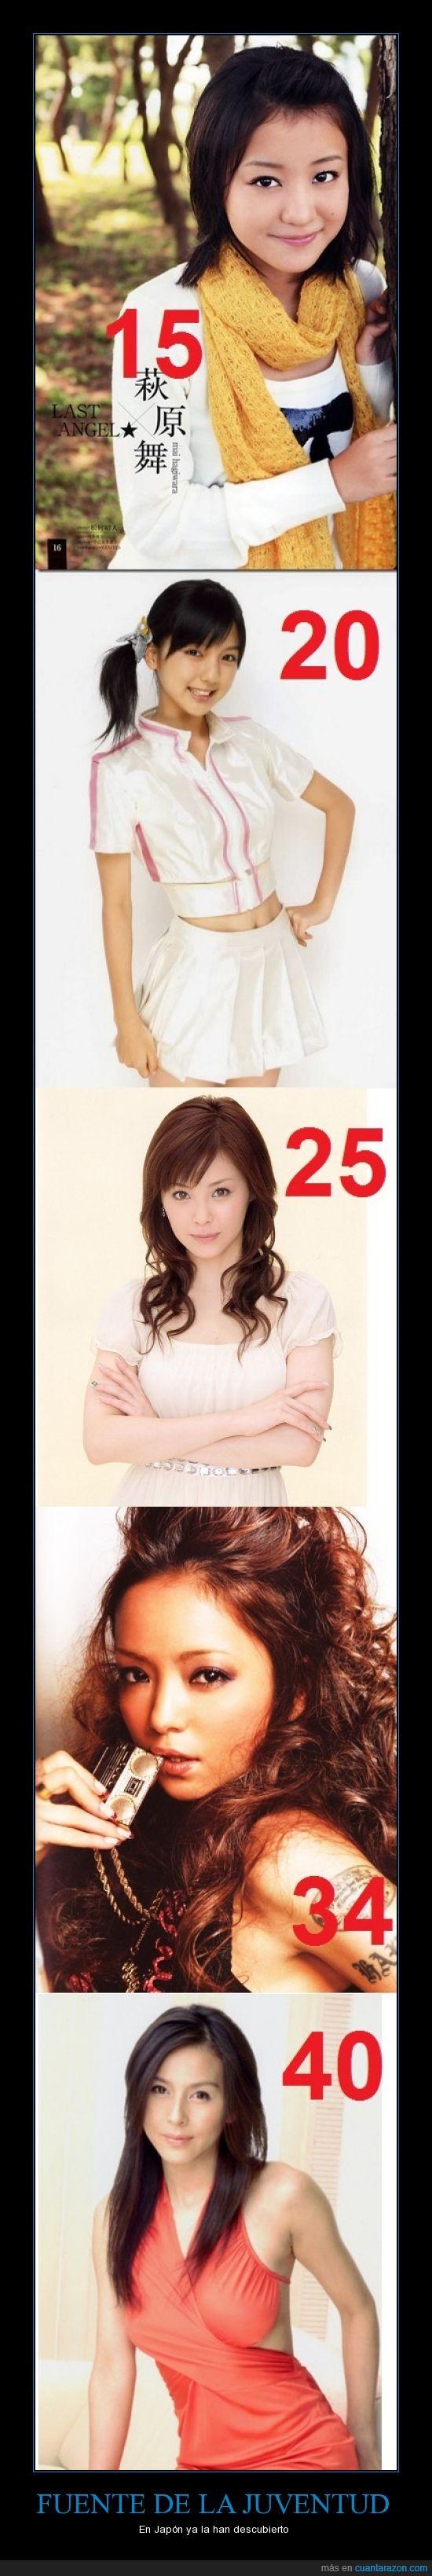 años,japon,japonesas,juventud